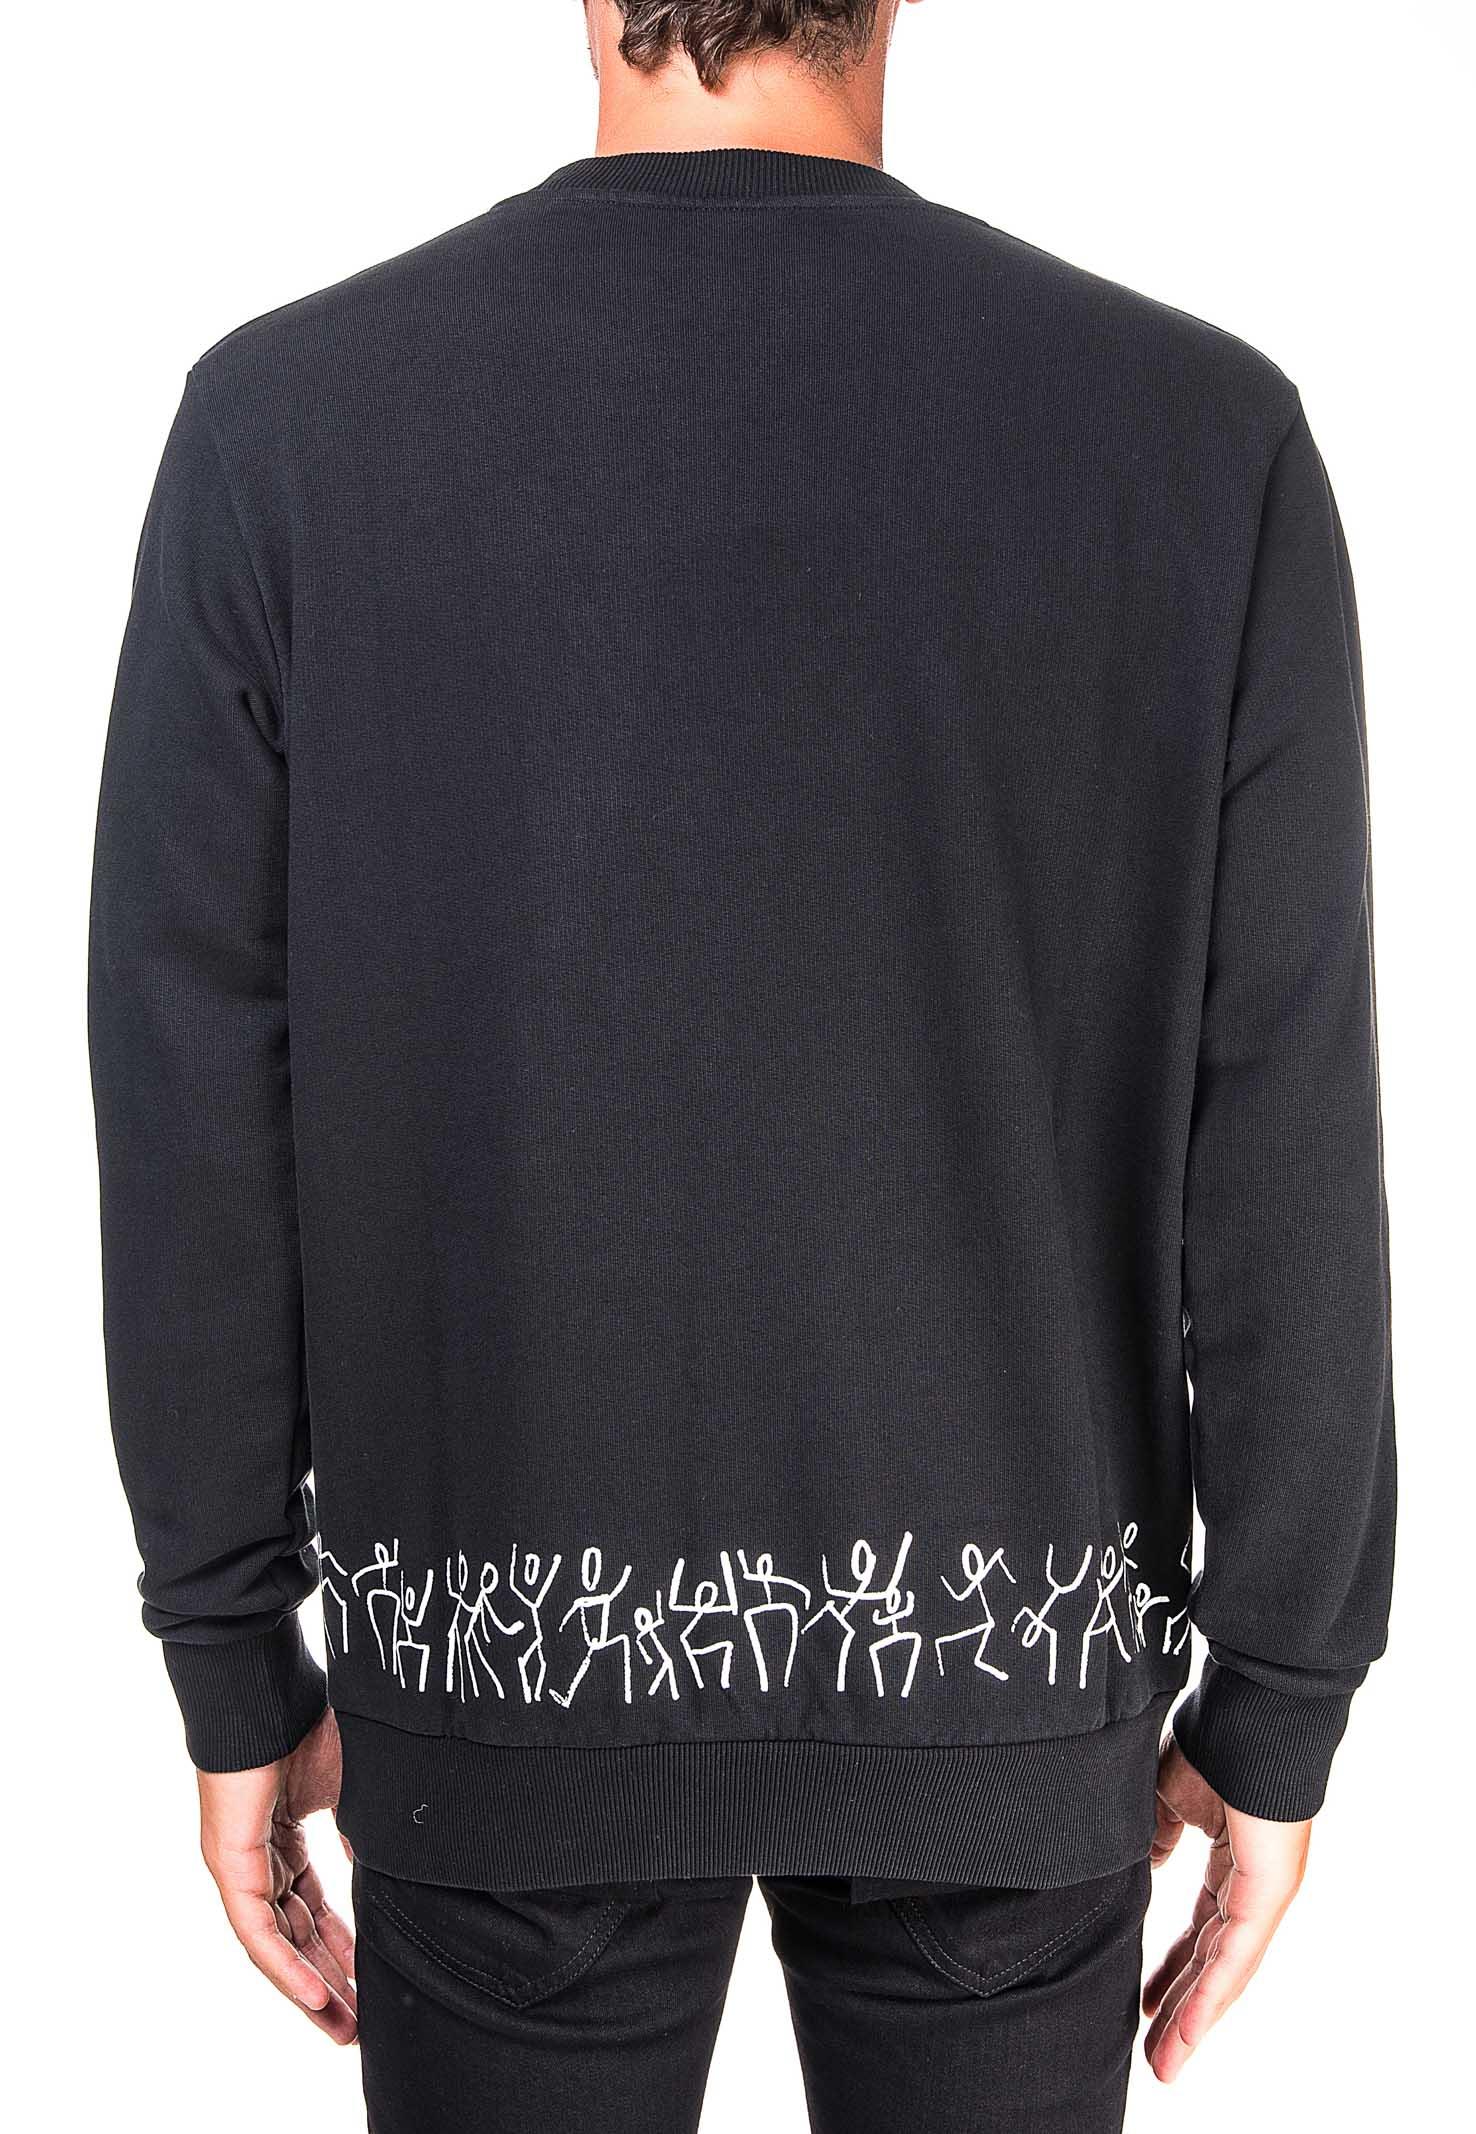 BLACK COTTON SWEATSHIRT TRIBE REGULAR CREWNECK MODEL MARCELO BURLON | Sweatshirts | CMBA009E20FLE0061001